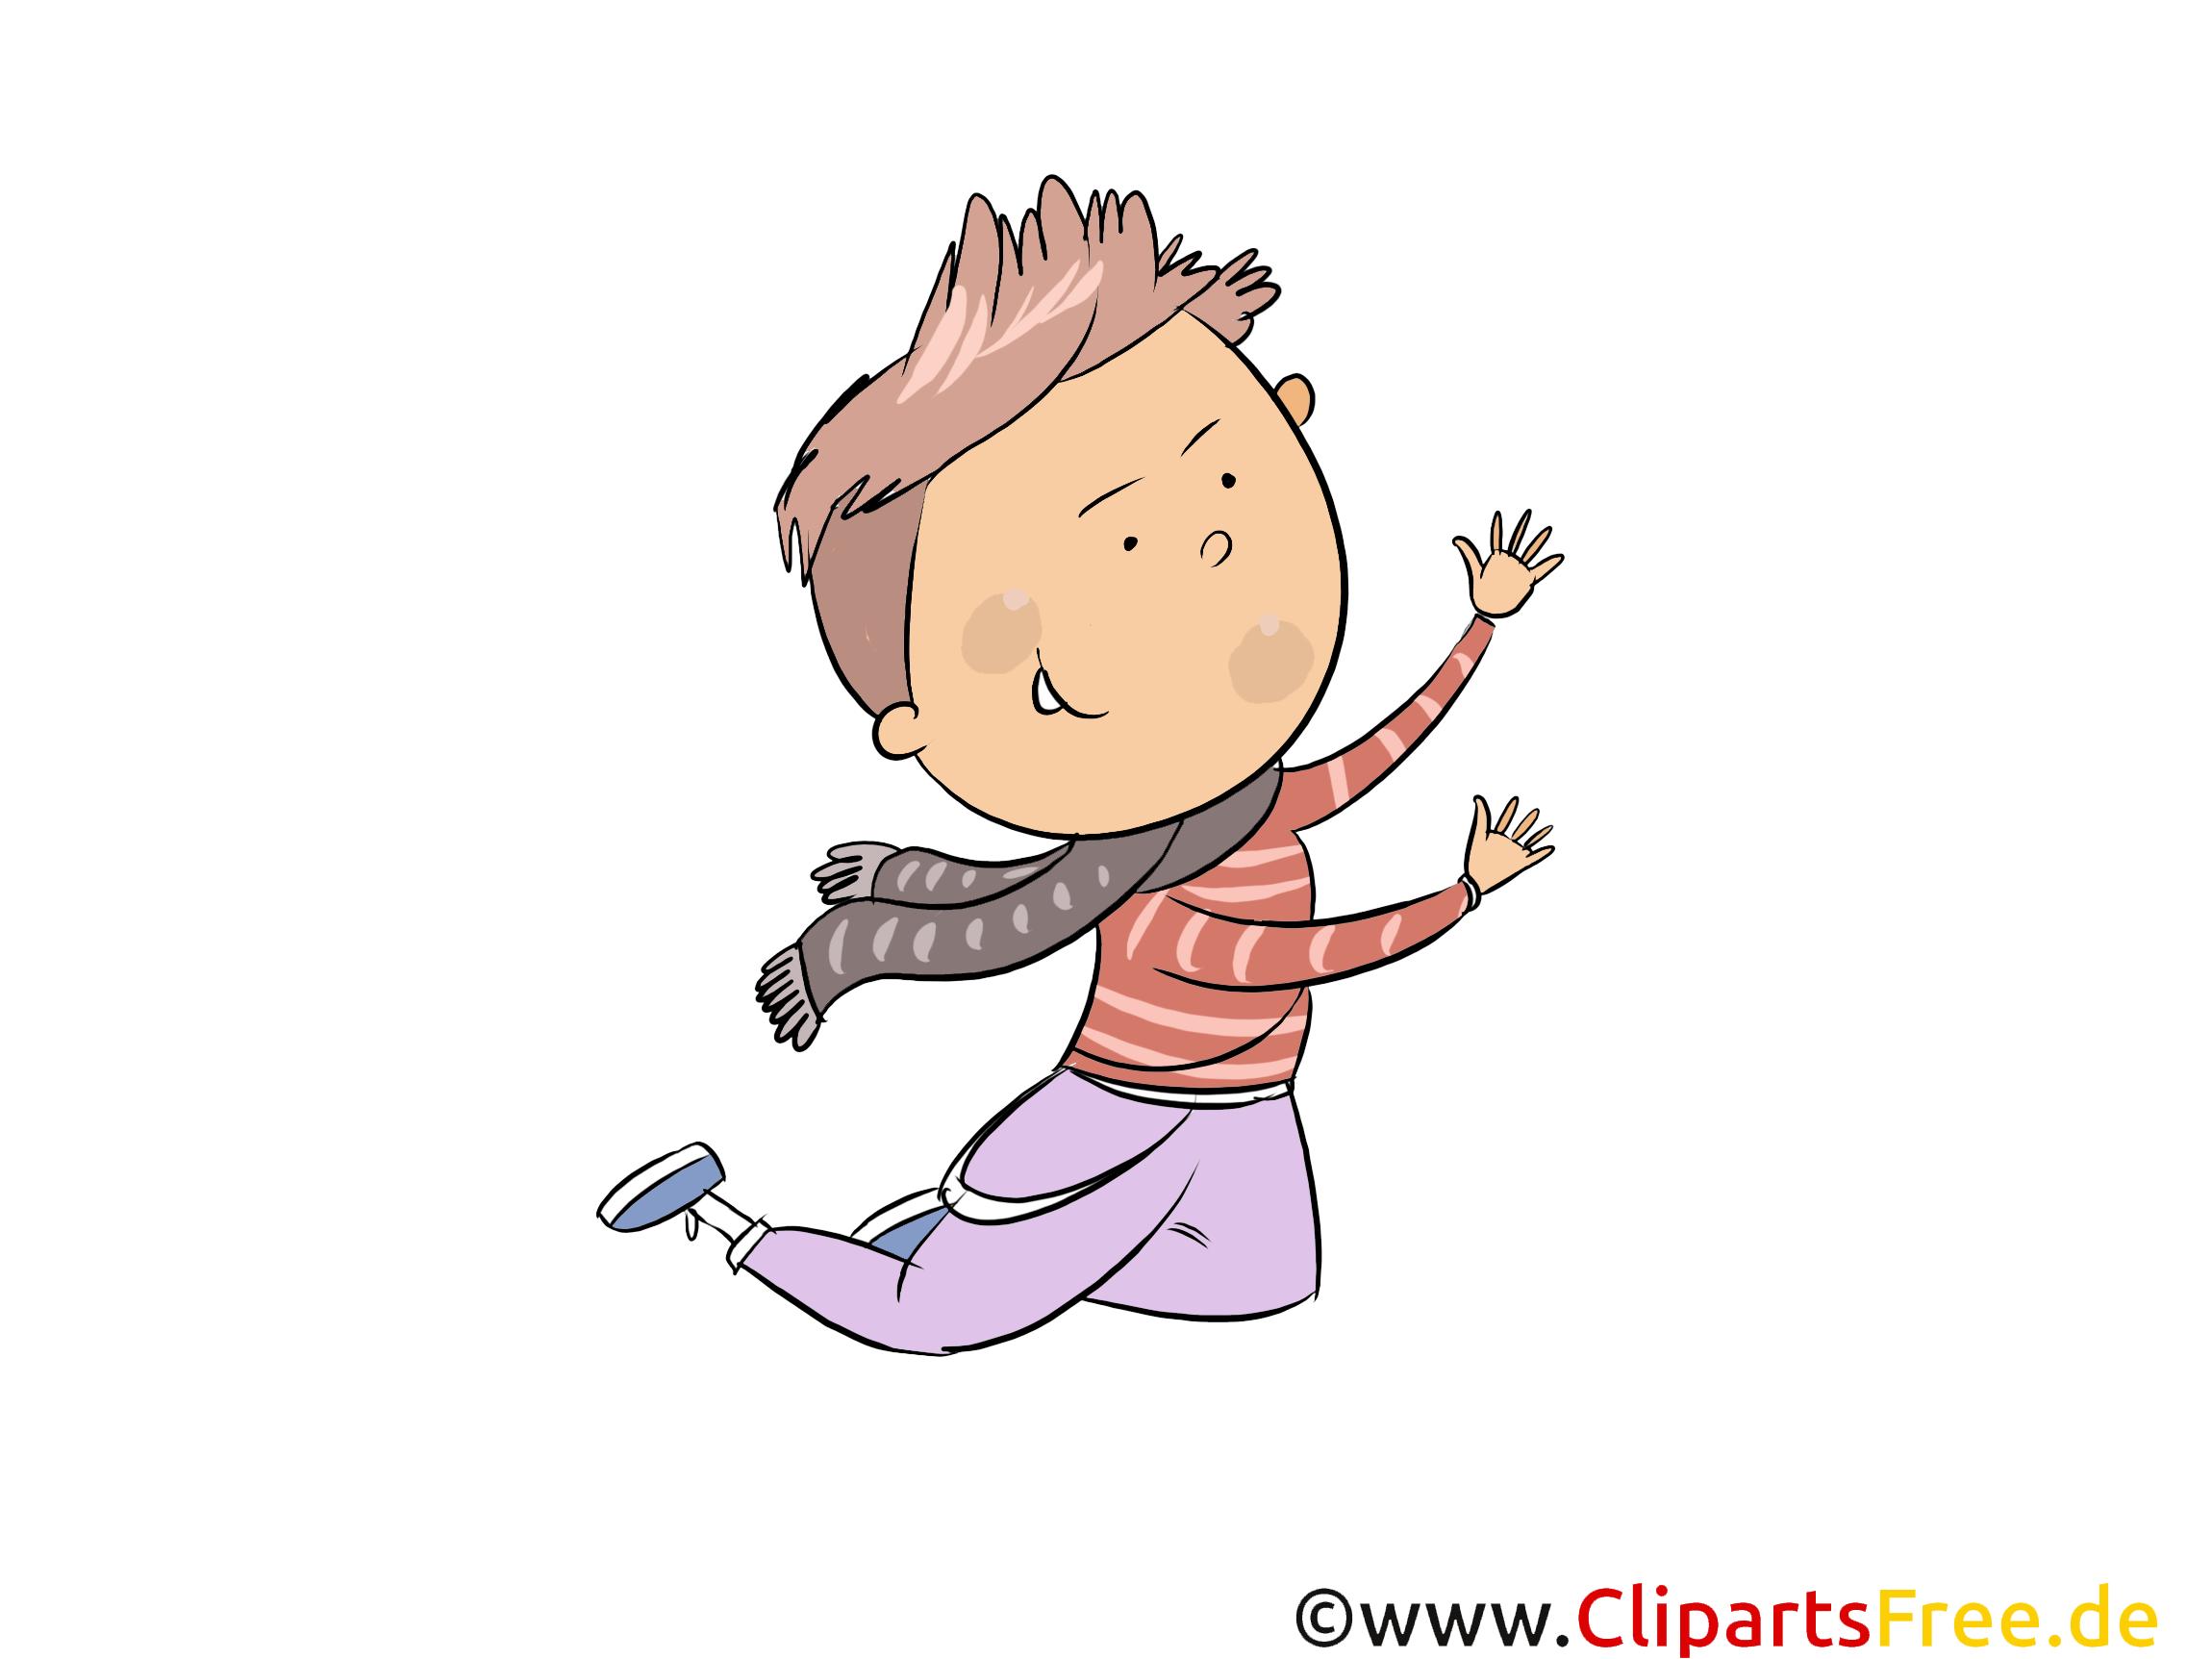 Junge springt - Kinder Clipart kostenlos